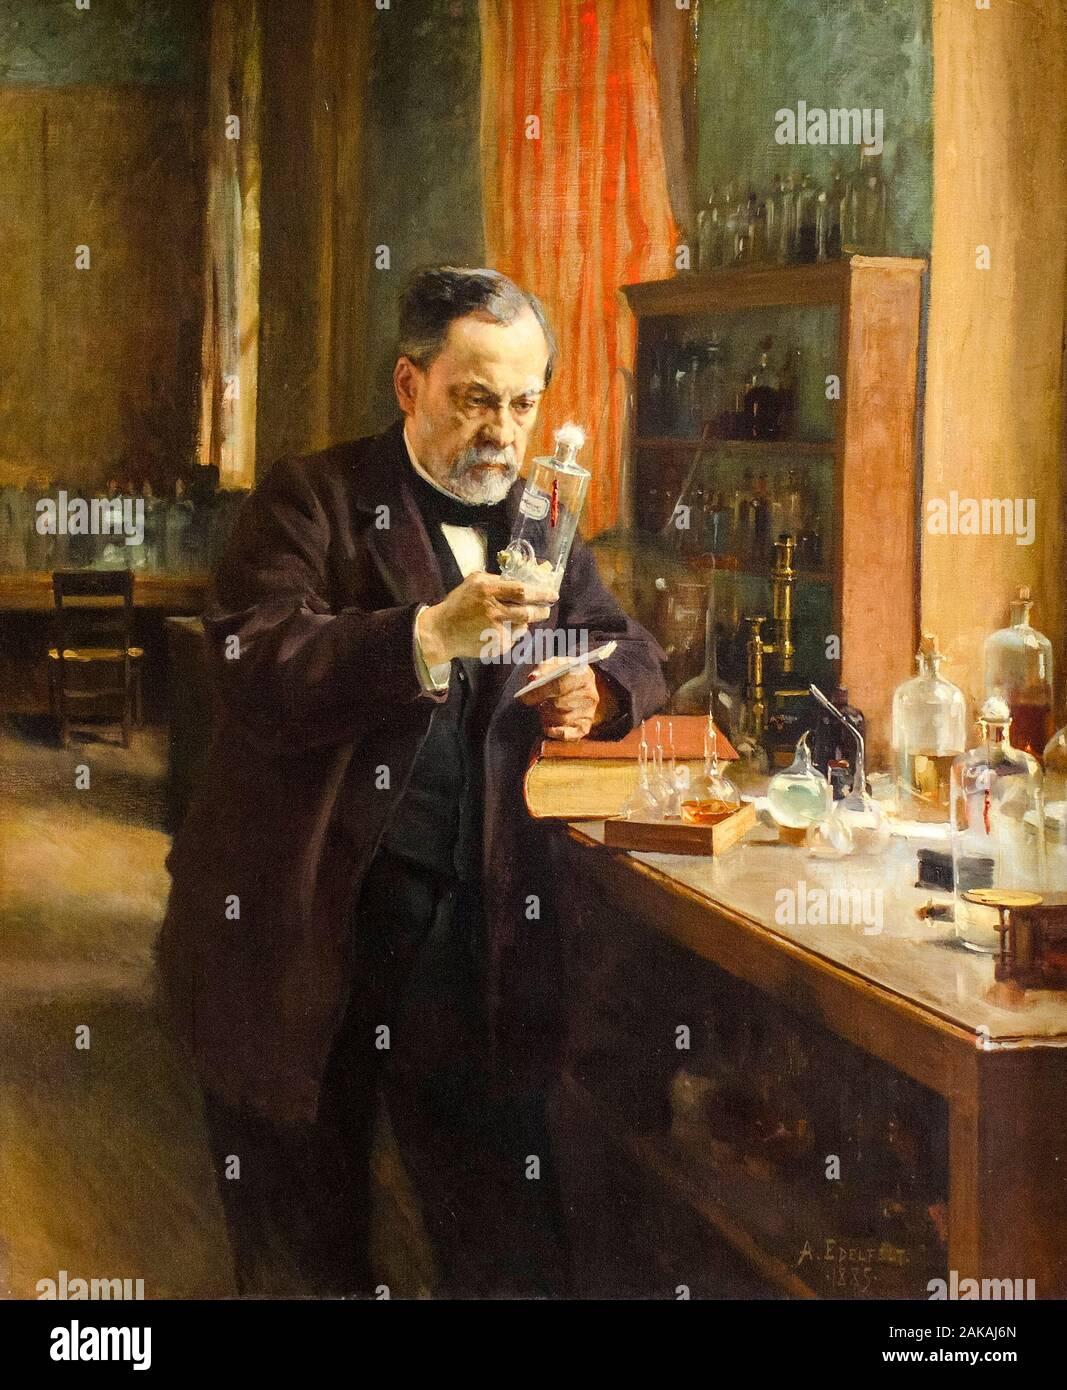 Louis Pasteur, (1822-1895), in his laboratory, portrait painting by Albert Edelfelt, 1885 Stock Photo